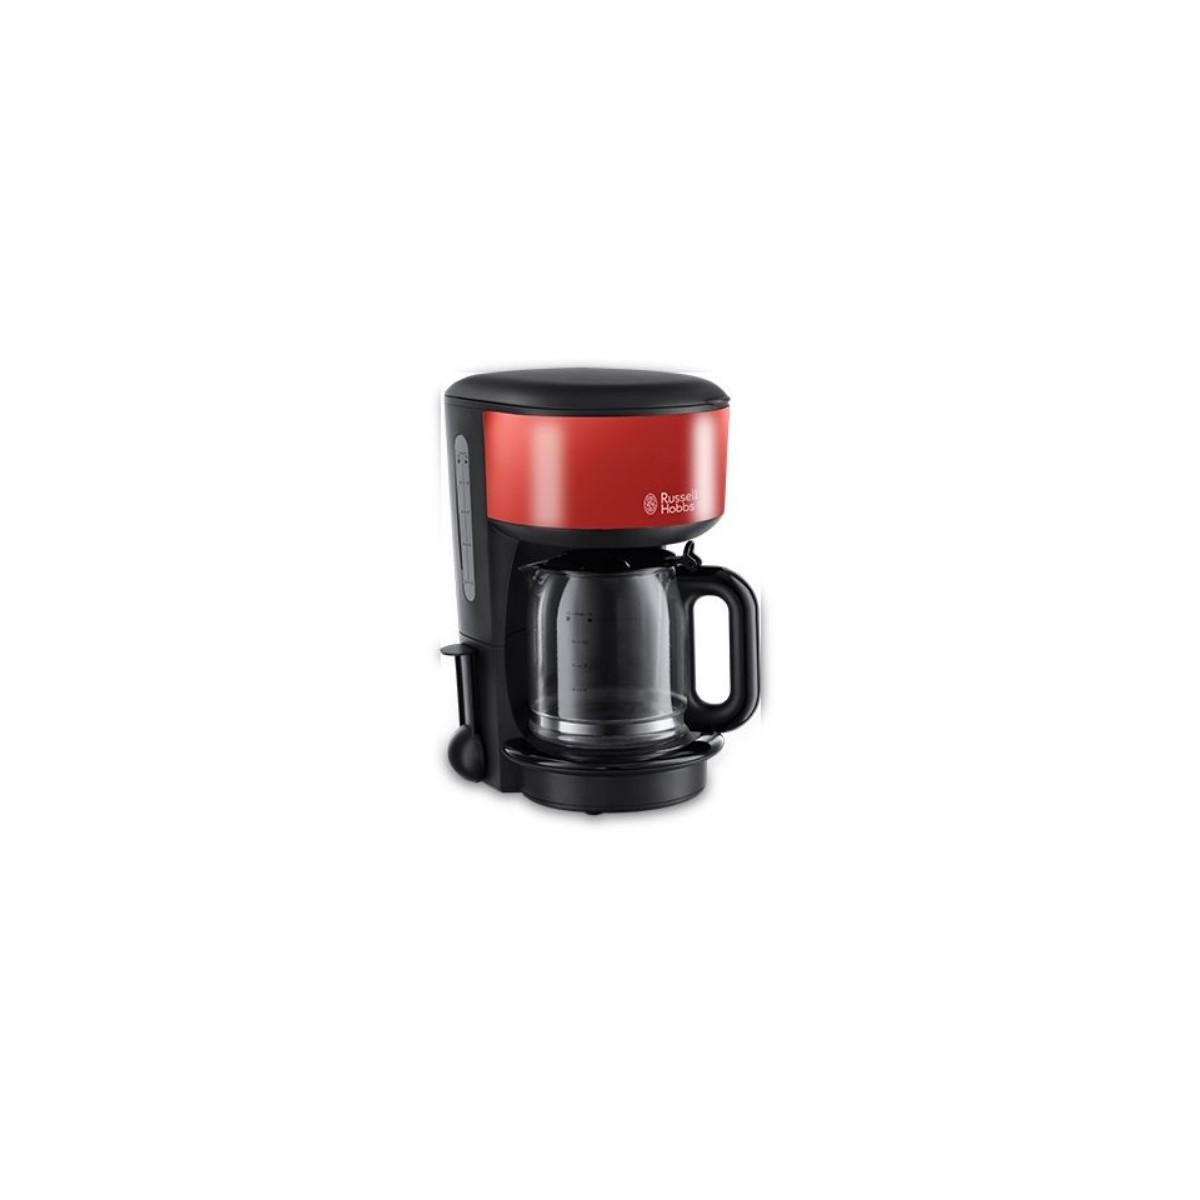 Cafetera Fuego Russell Hobbs RH2013156 10T Roja